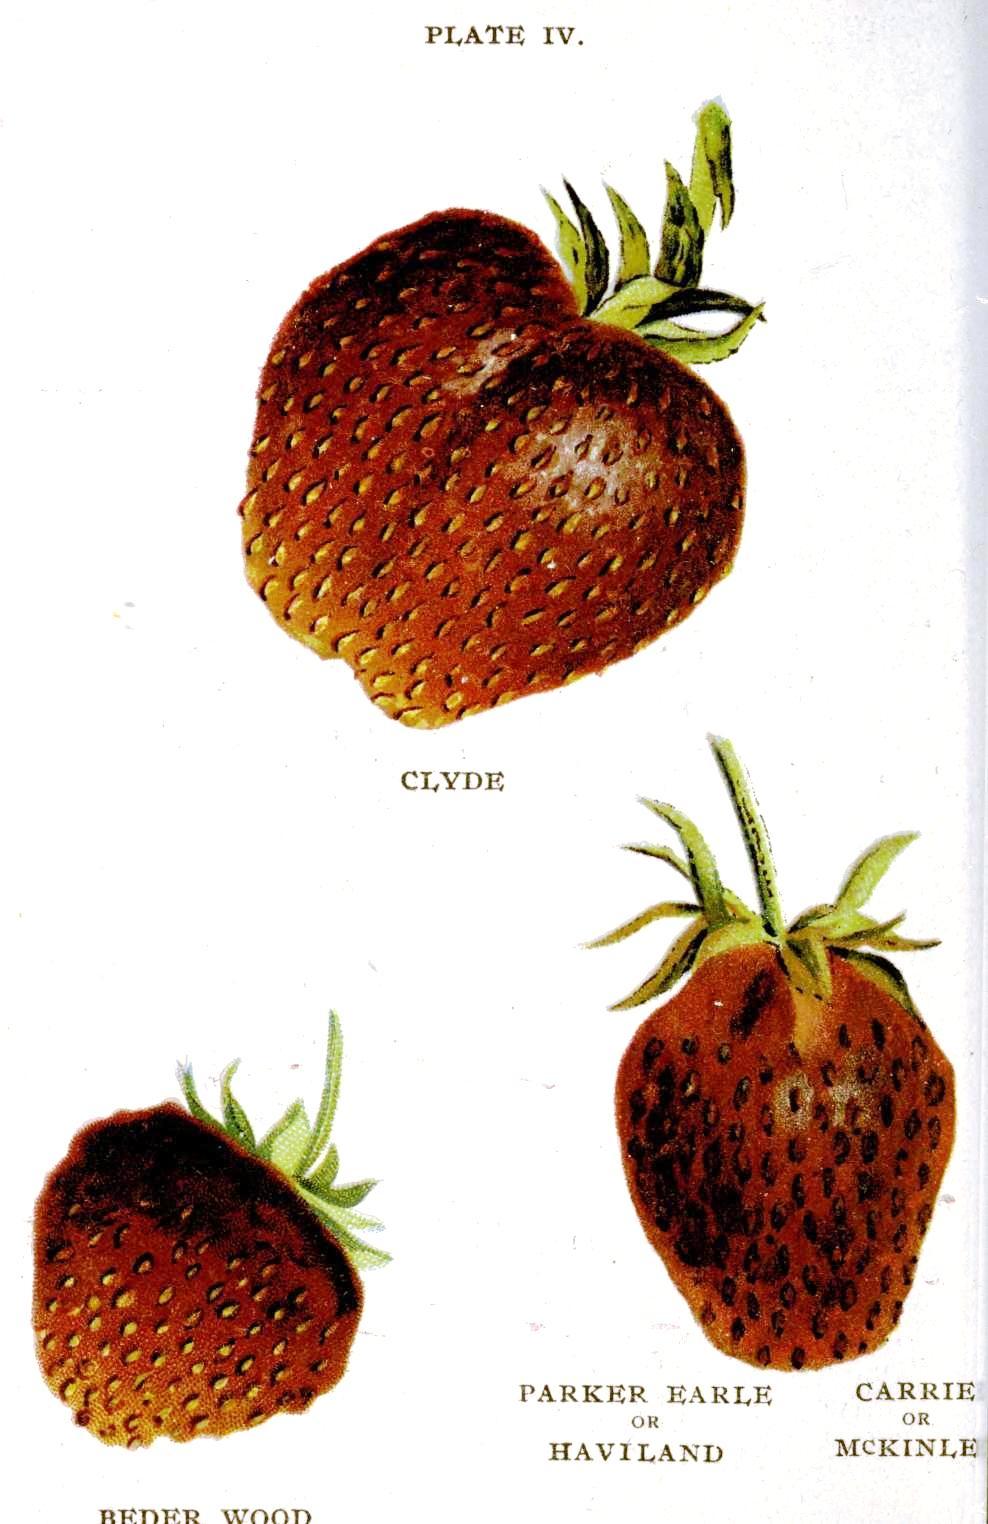 Botanical-Fruit-Biggles-Berry-Book-1899-Strawberry-2.jpg